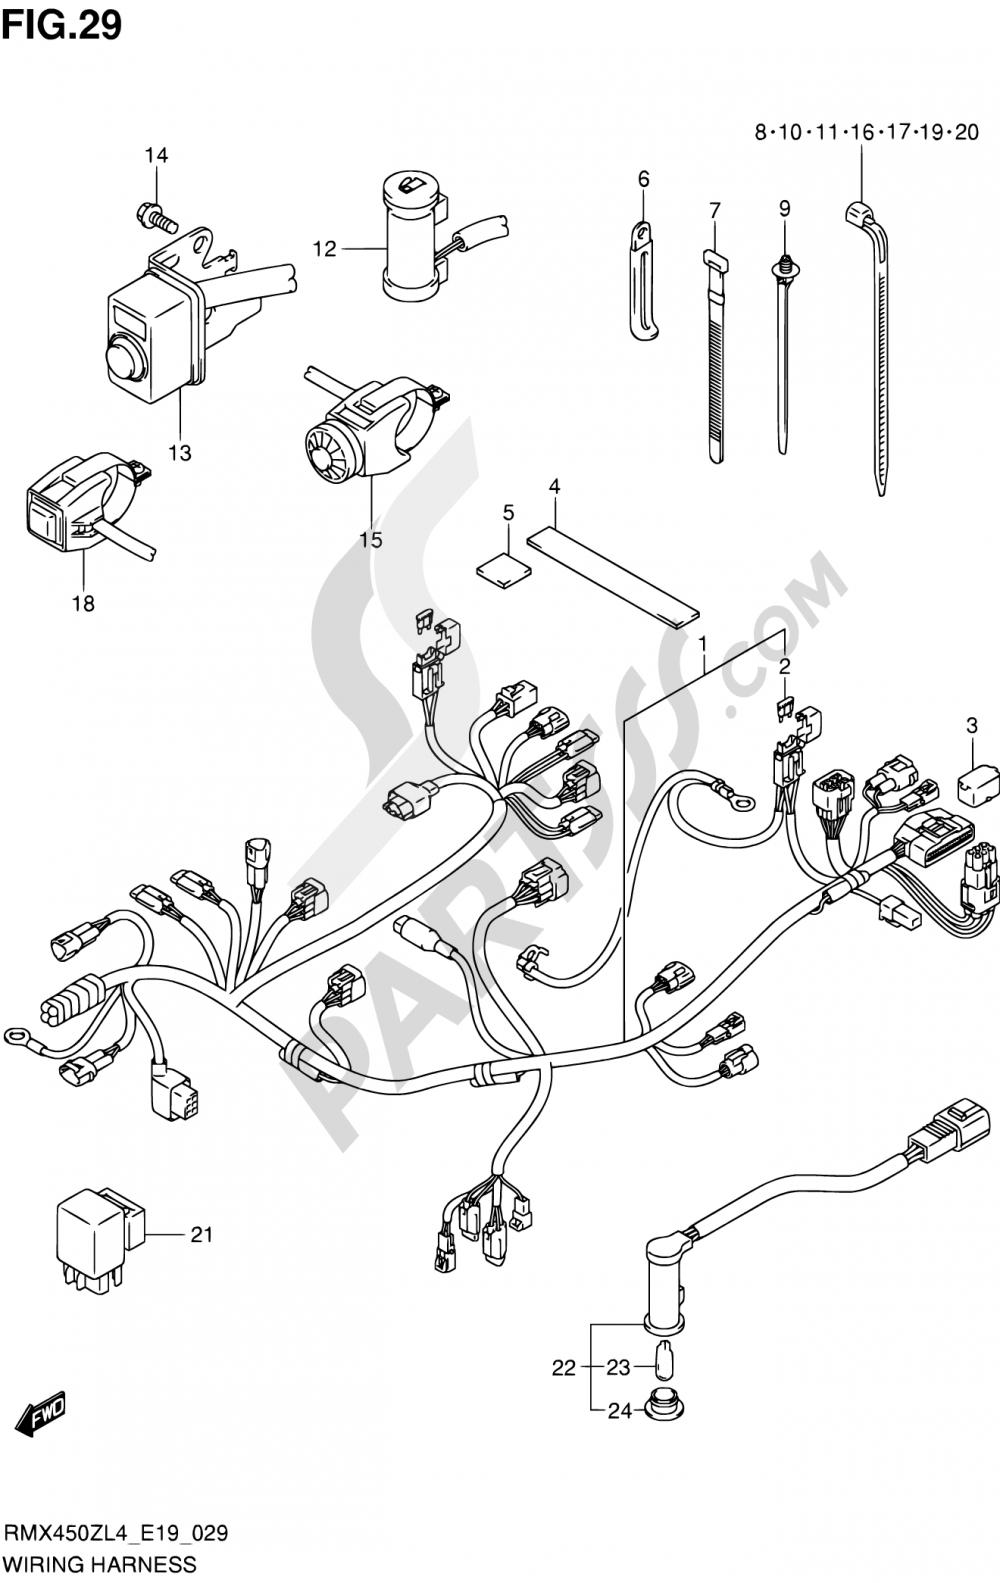 Suzuki Rmx450Z Wiring Diagram | Manual E-Books - Kubota B7800 Wiring Diagram